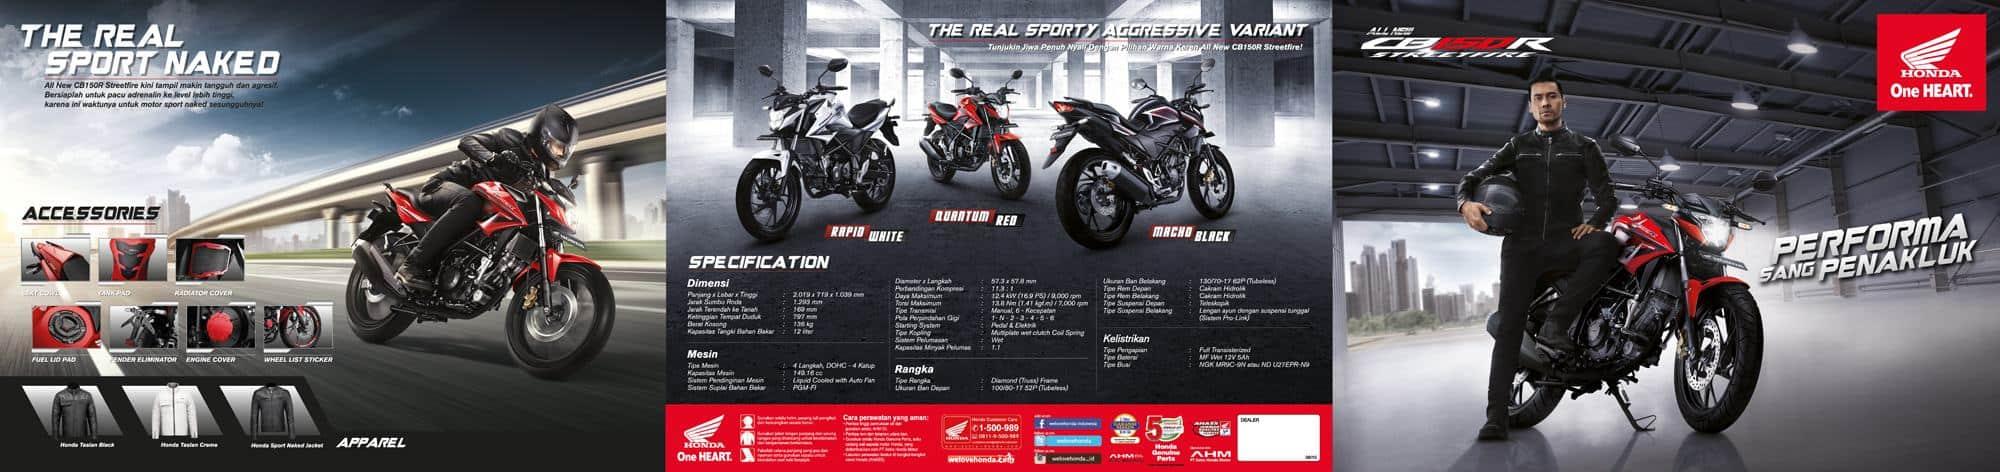 Brosur Motor Honda CB150R StreetFire 1